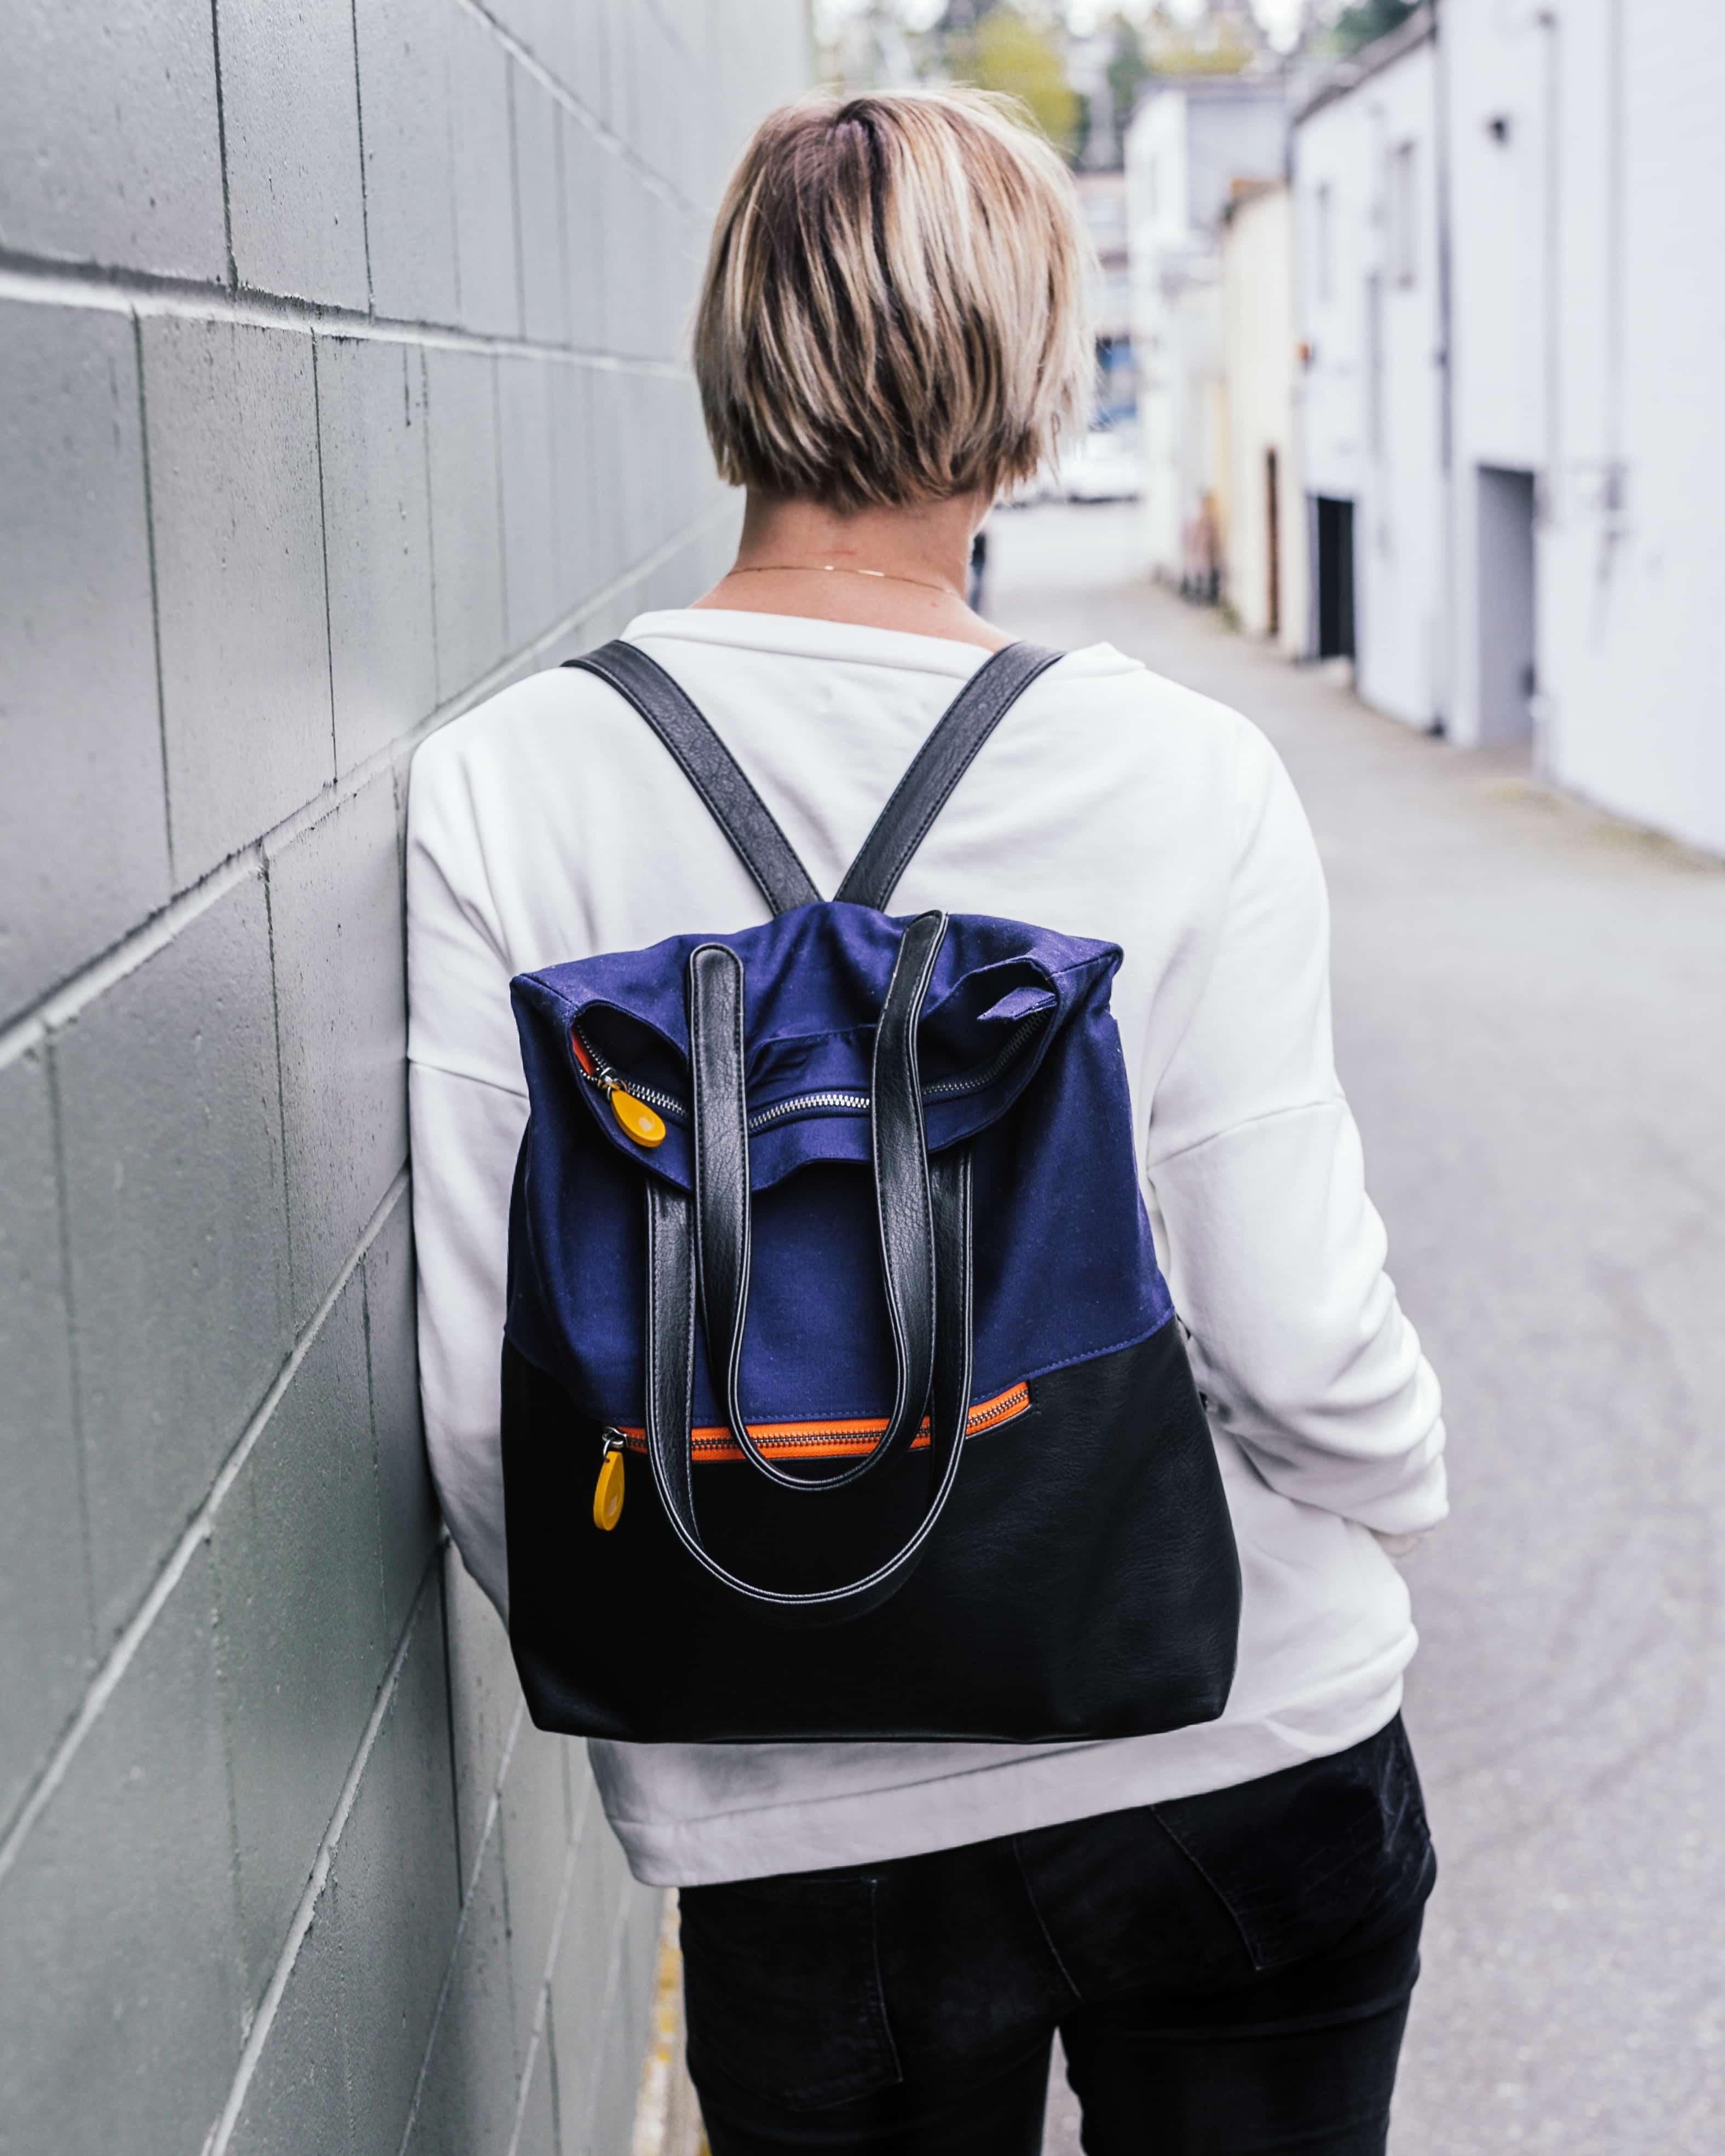 7a83250e23c9 Greenpoint Vegan Backpack